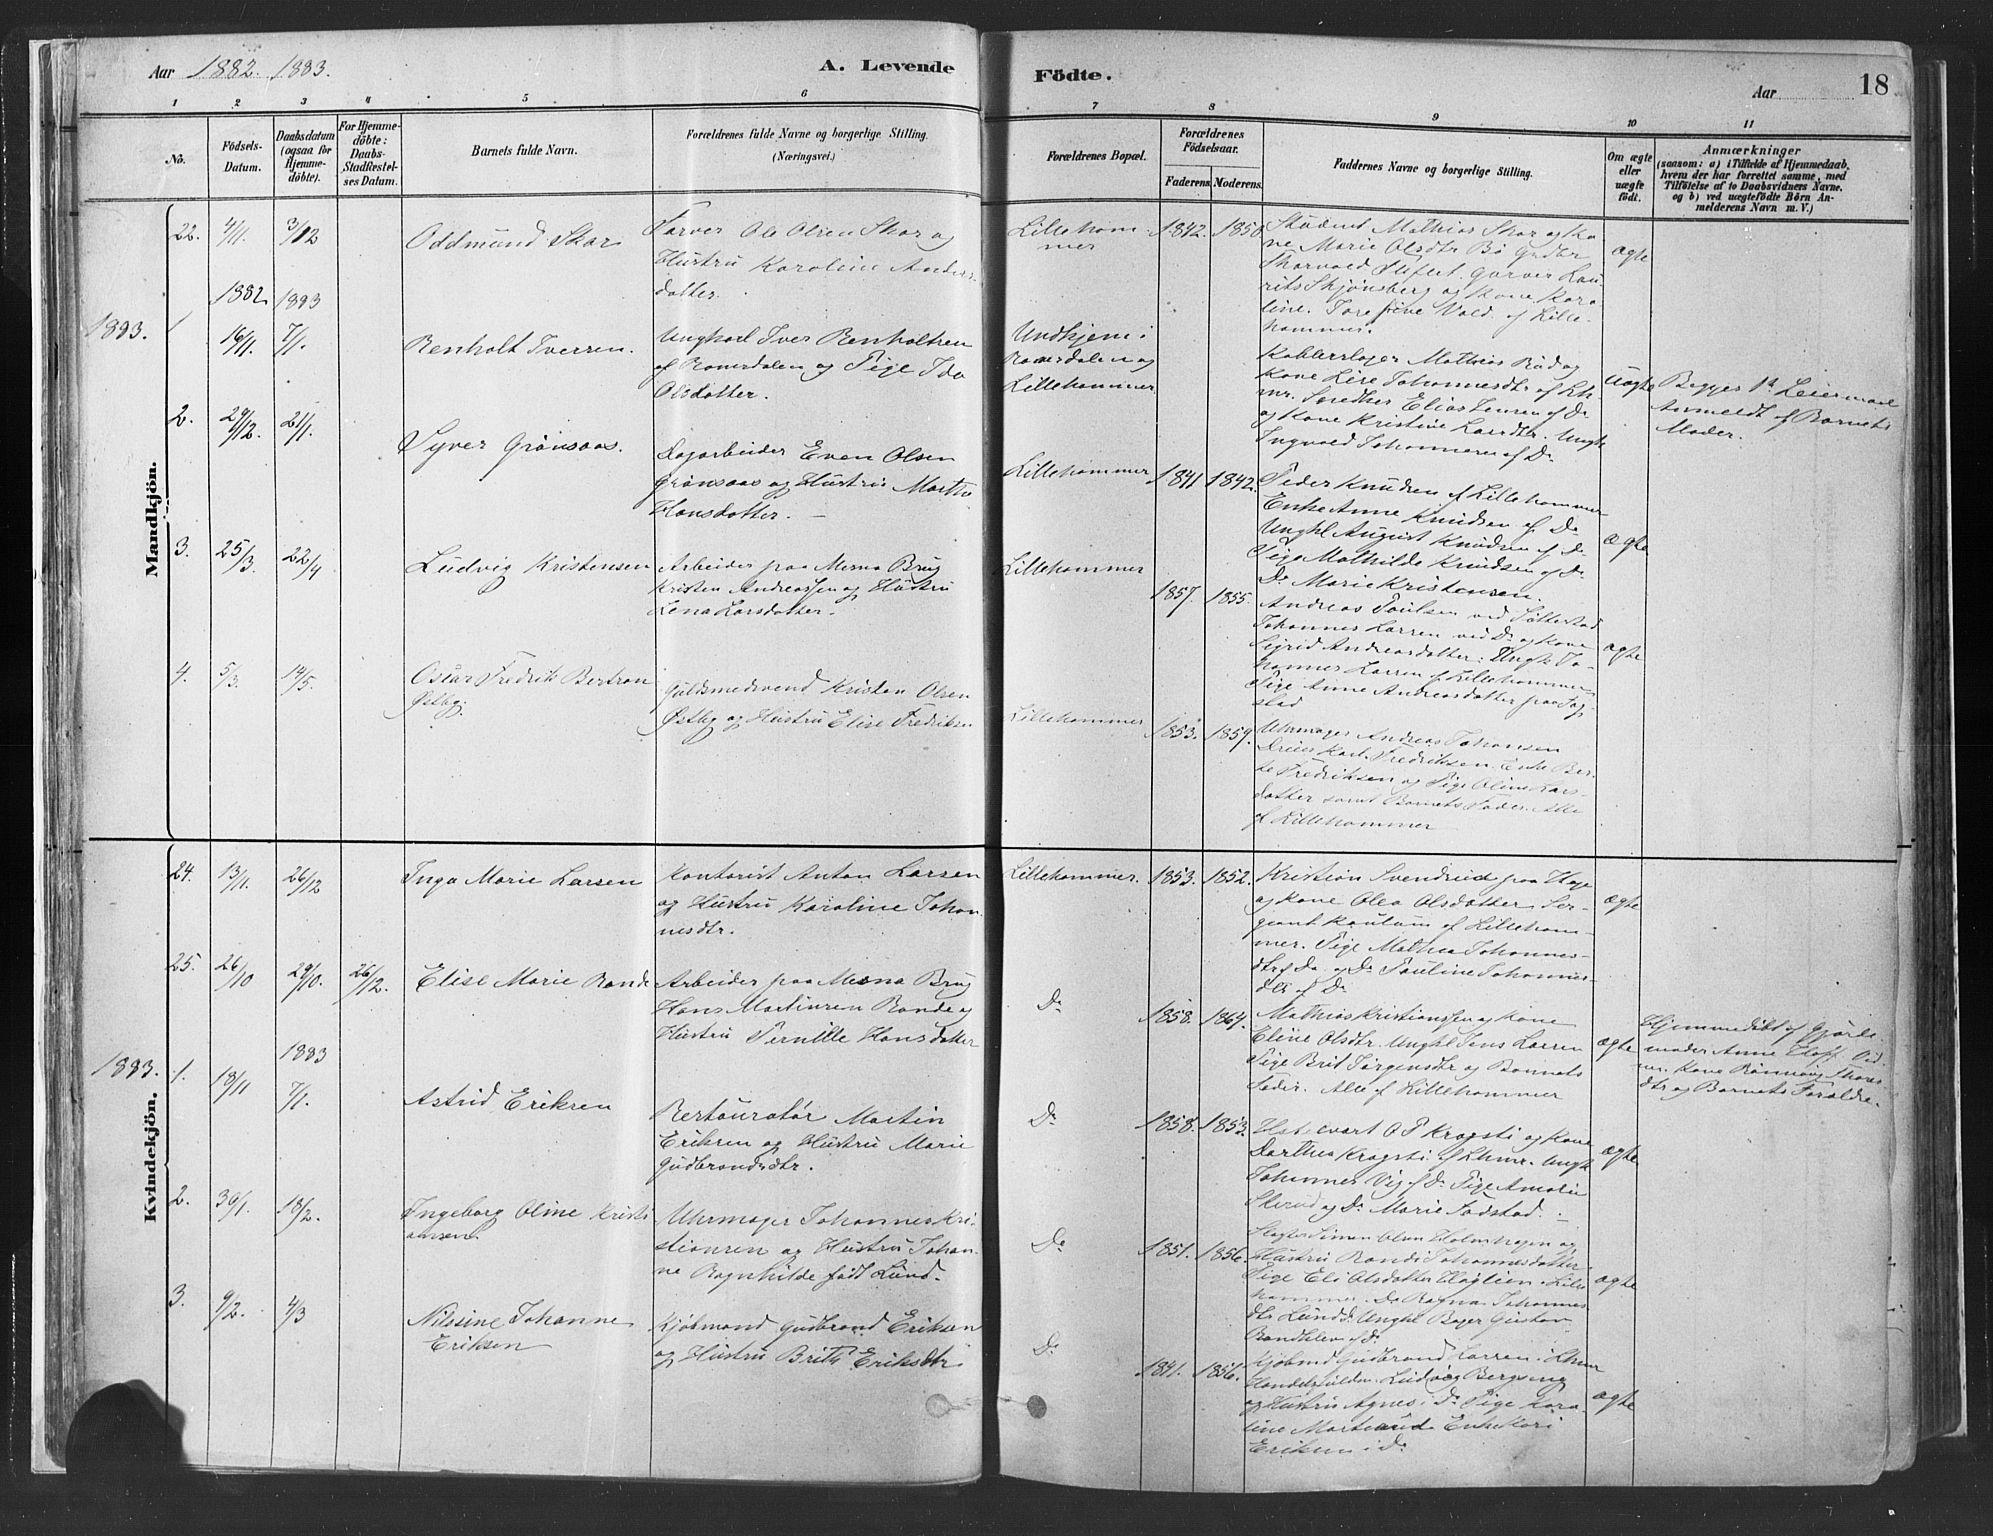 SAH, Fåberg prestekontor, Ministerialbok nr. 10, 1879-1900, s. 18